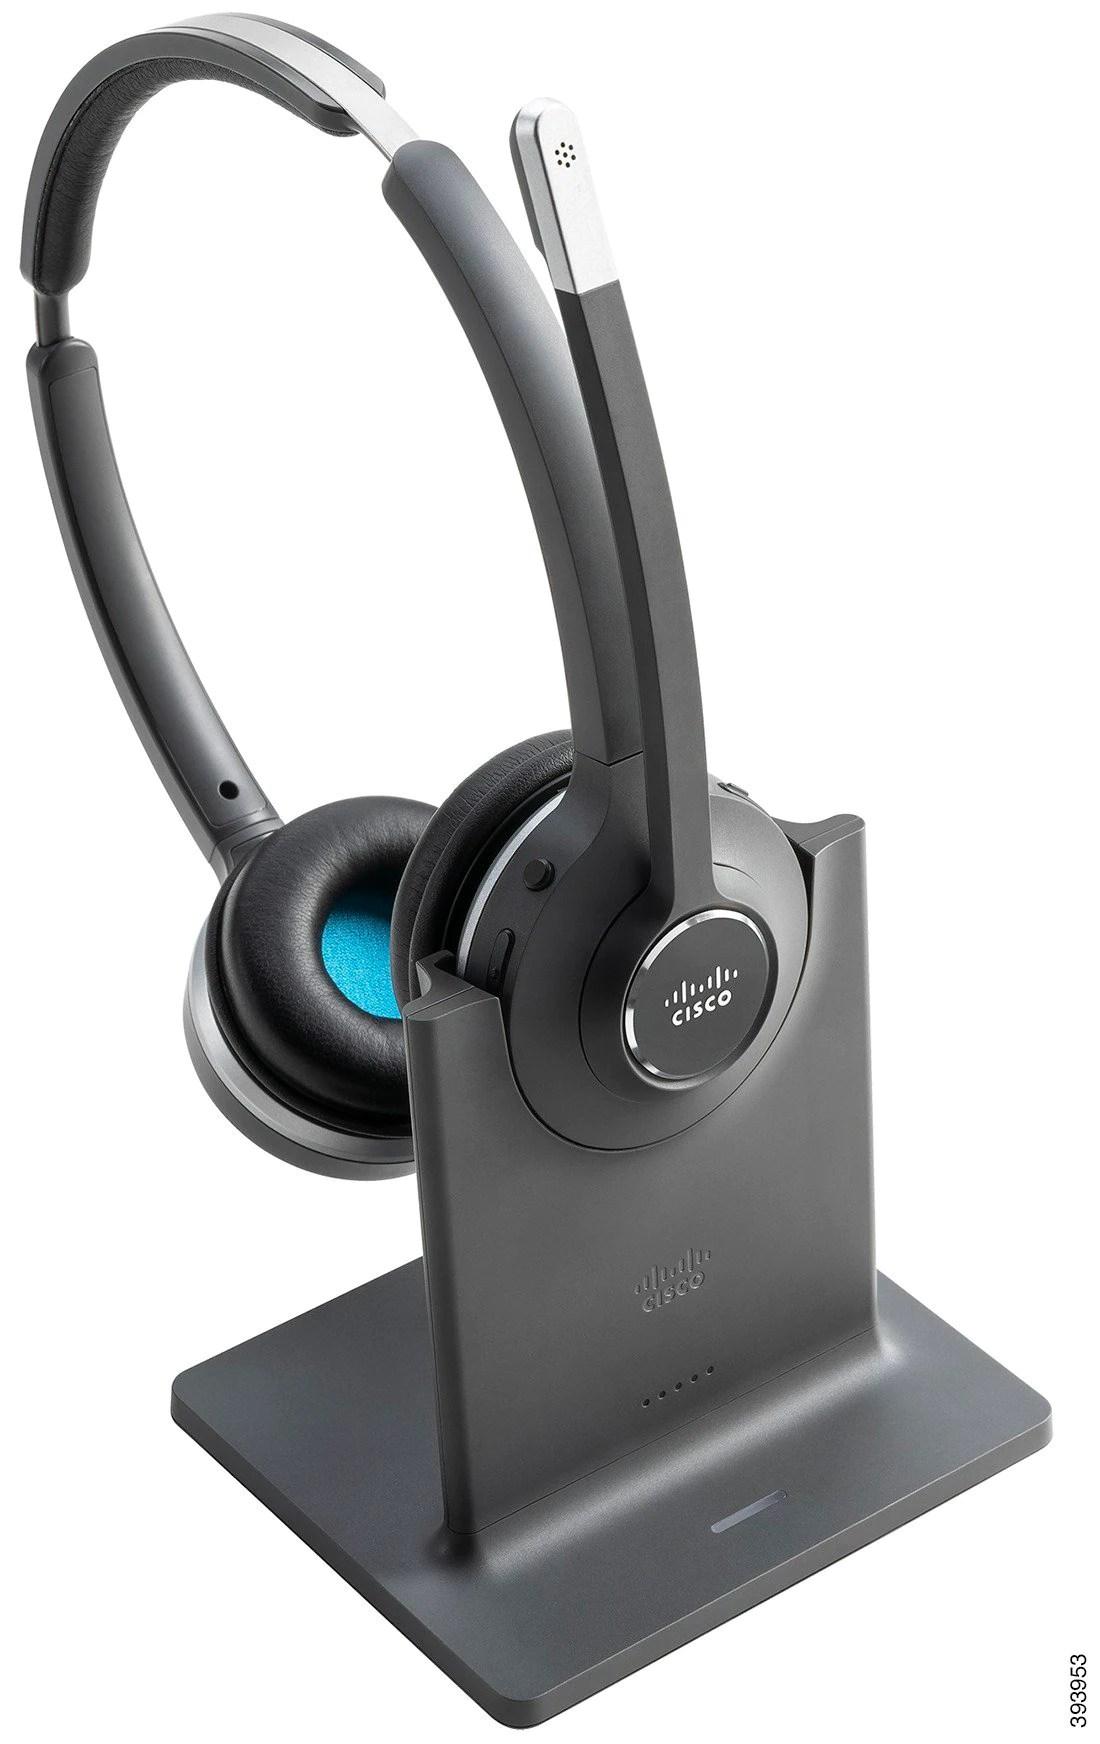 hight resolution of cisco headset 562 cisco headset 562